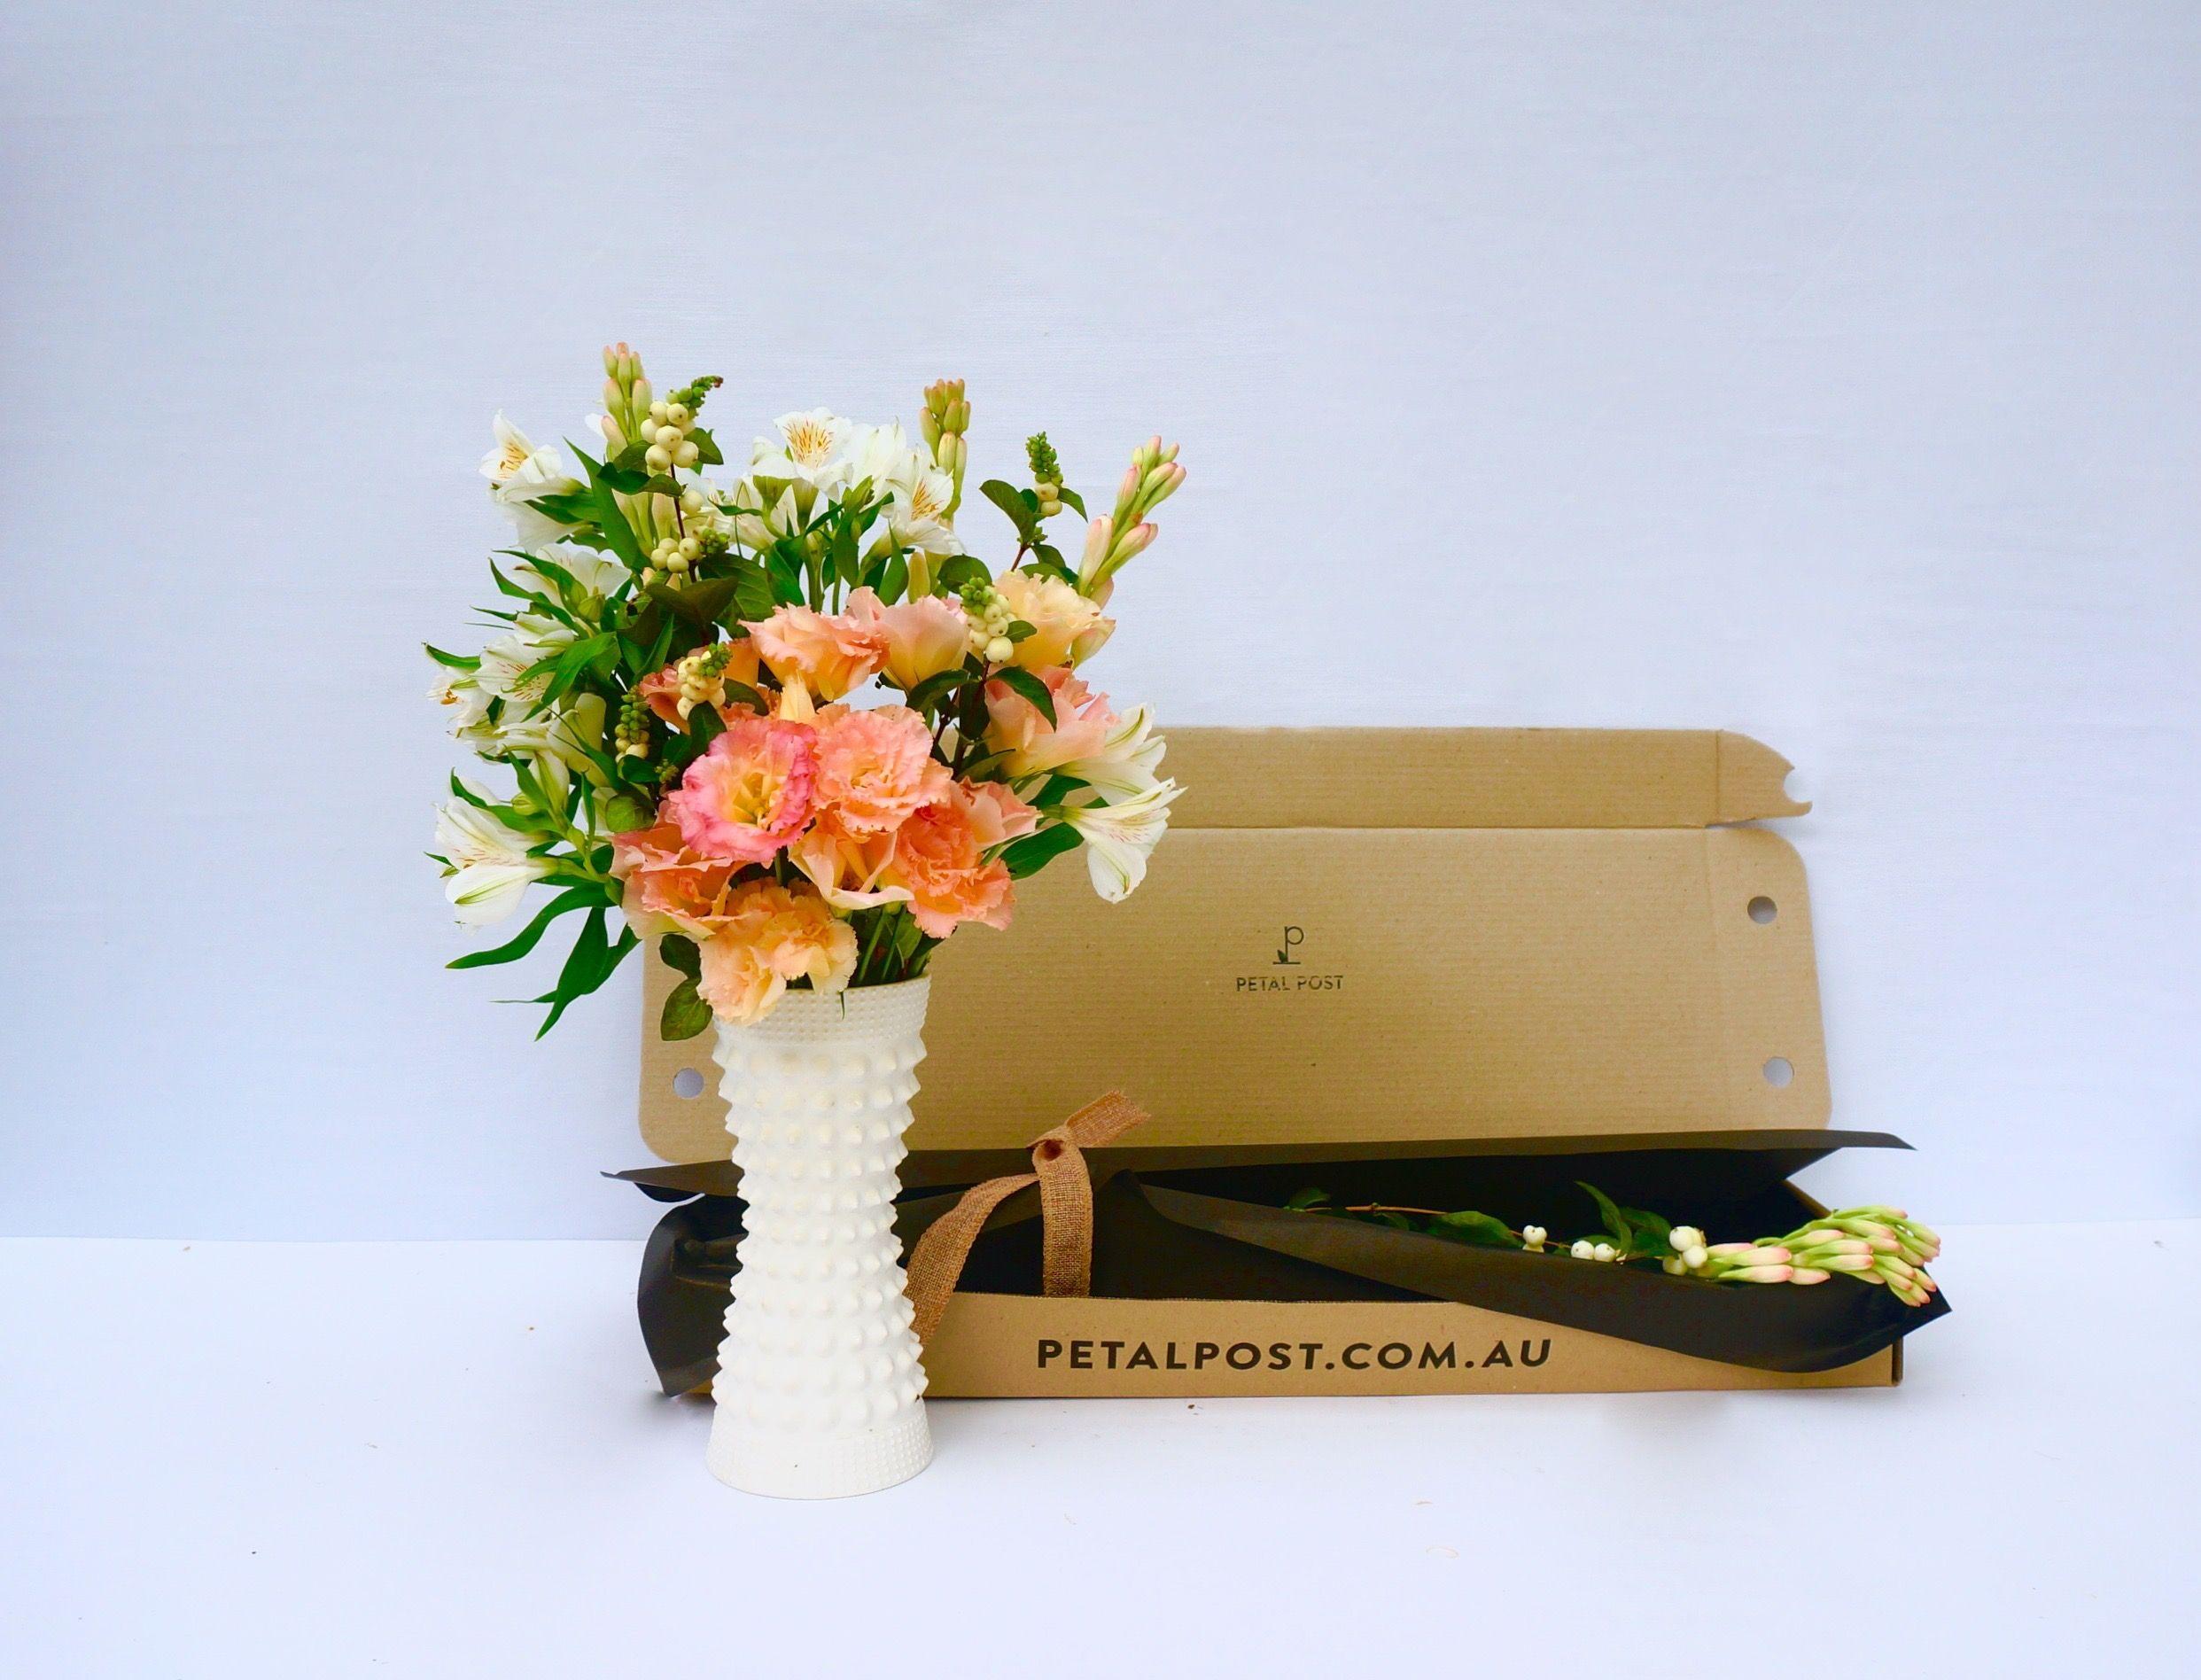 Lisianthus, Tuberose, Snowberry, Alstro Flower service